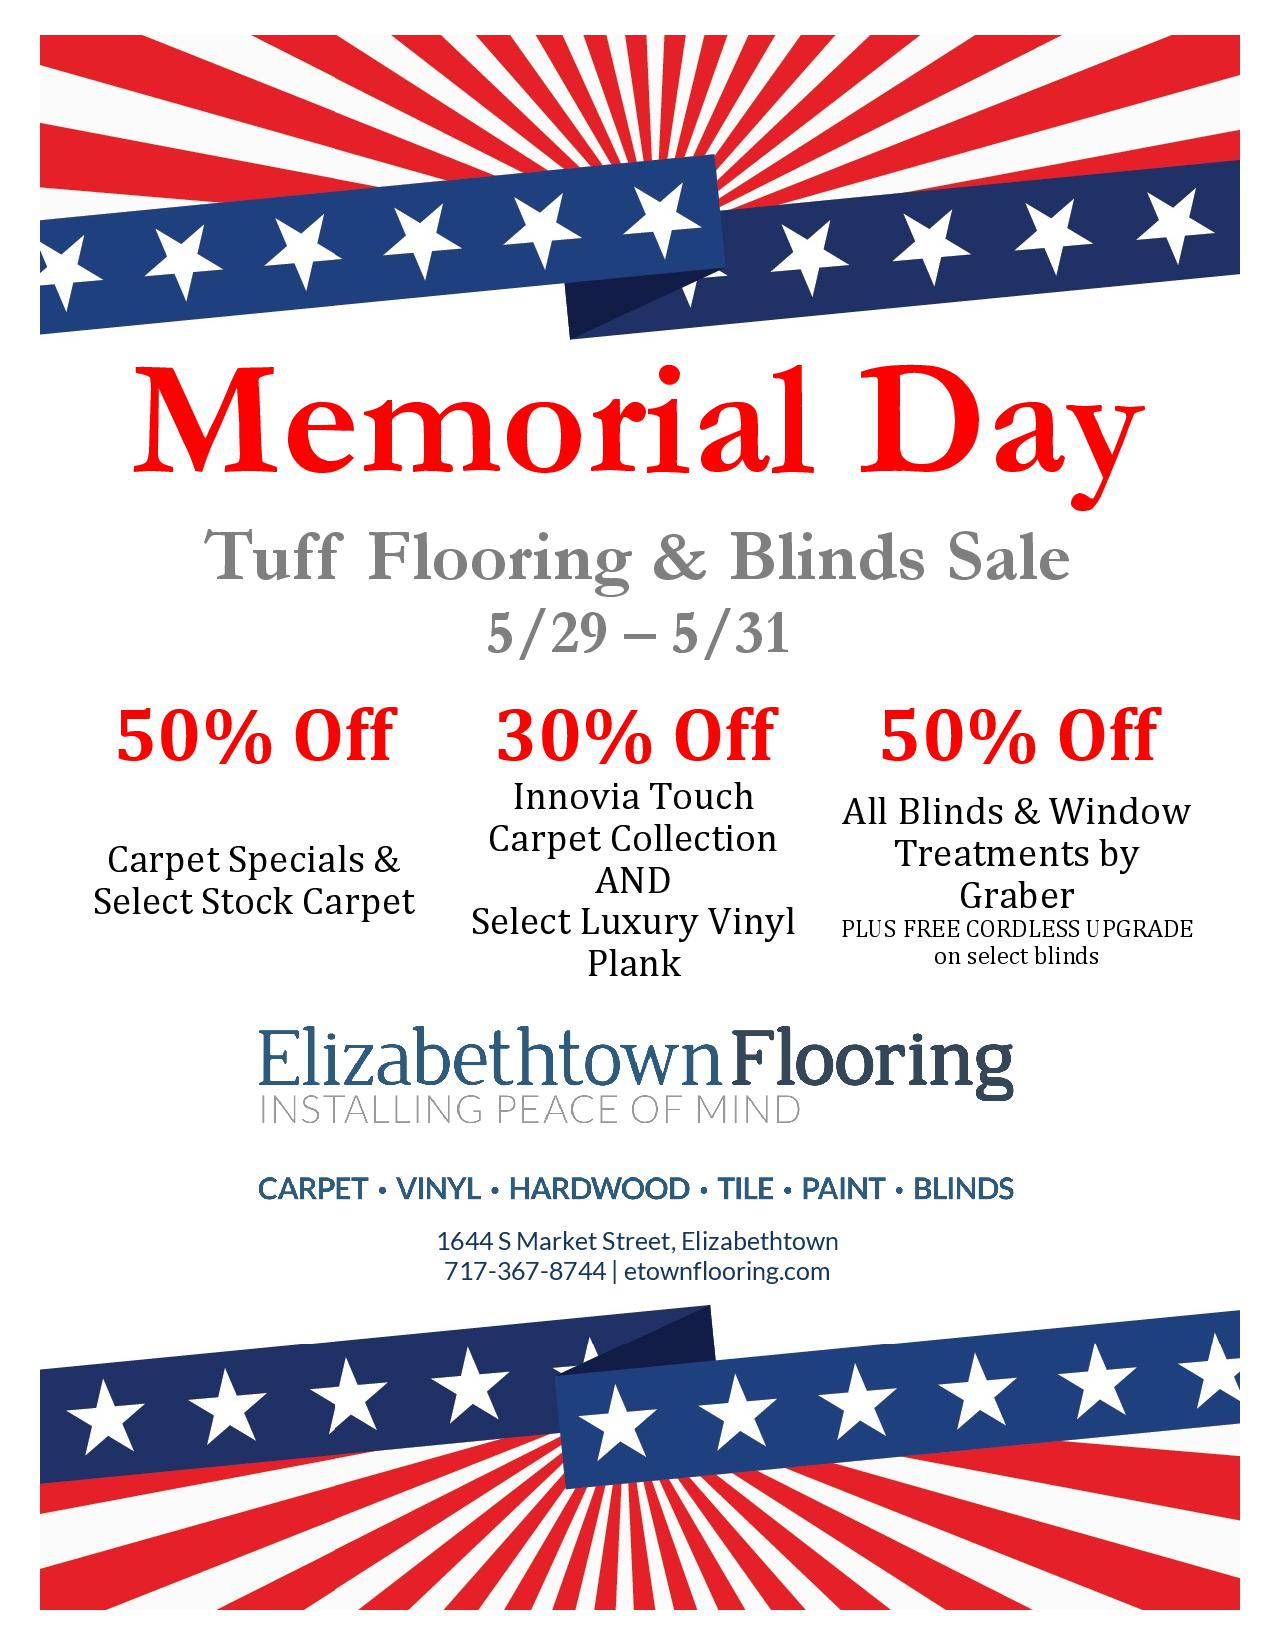 Memorial Day Tuff Flooring 2018 Sale Flyer1.jpg